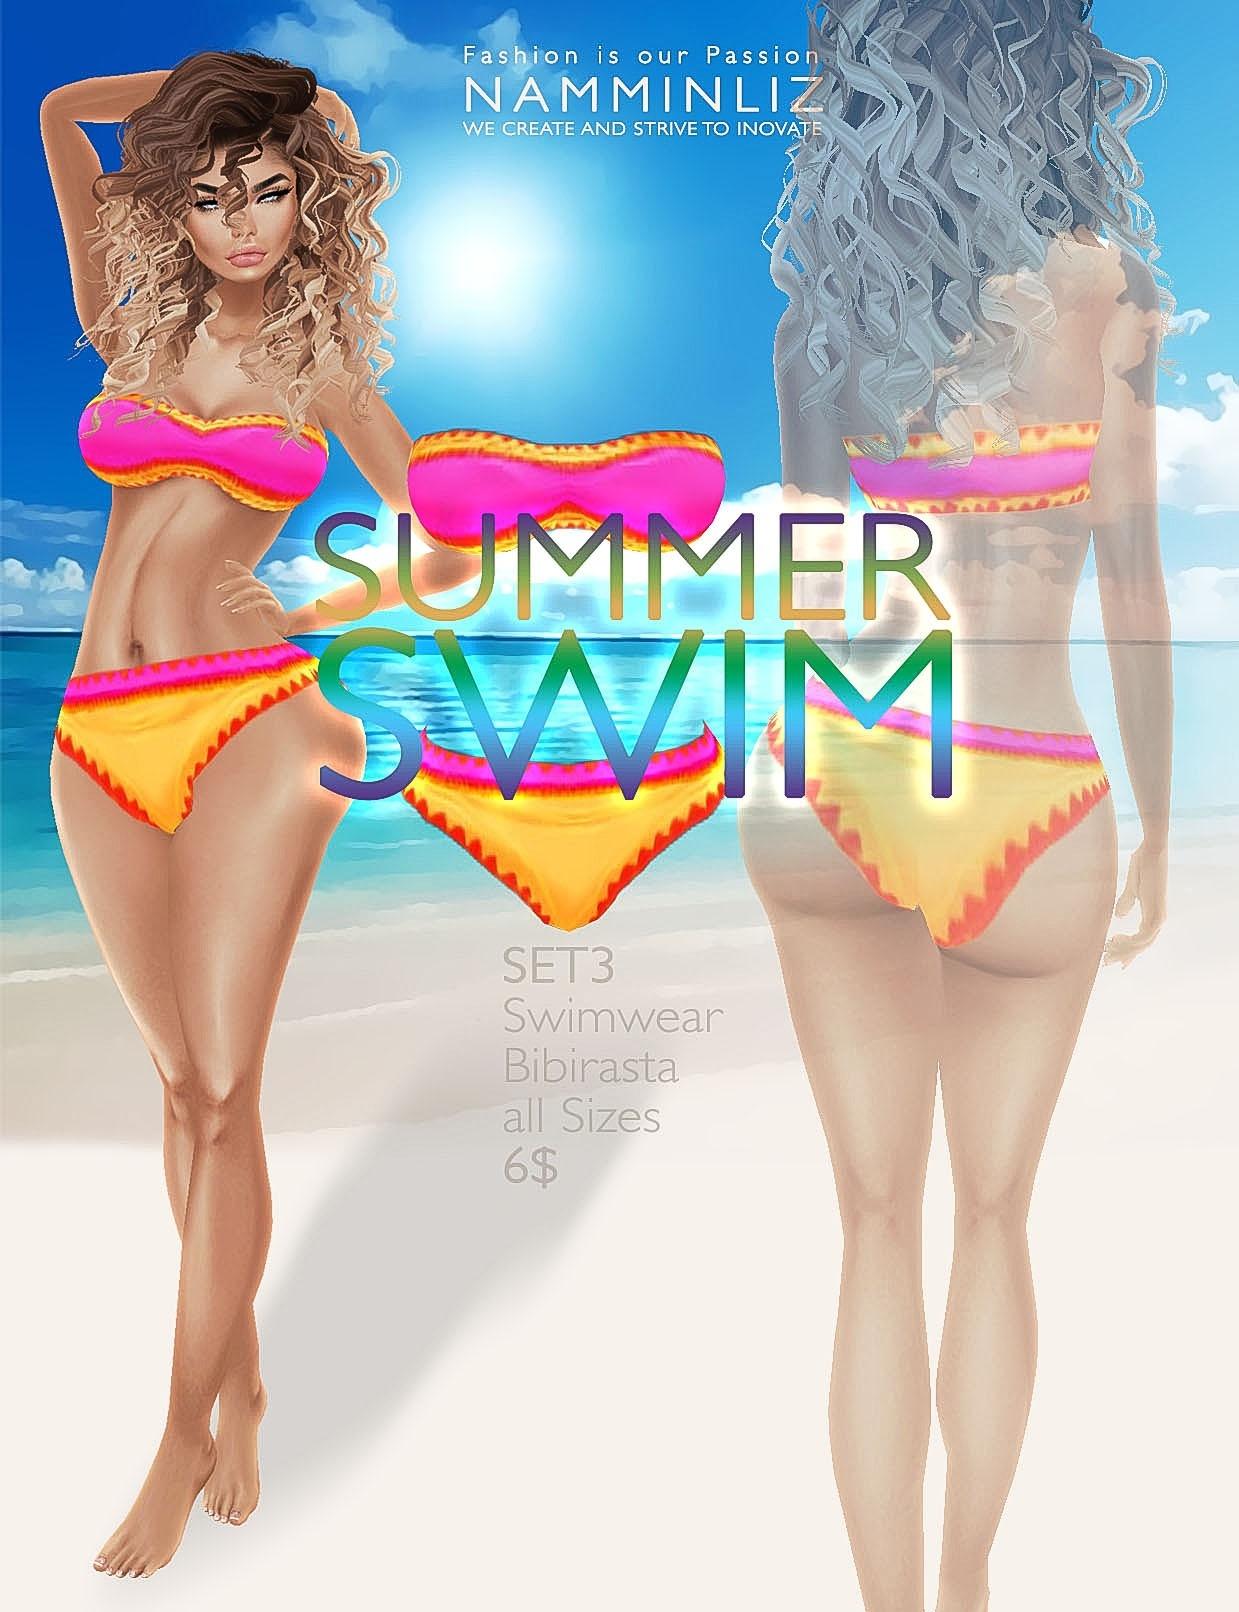 Summer swim Full SET imvu Bibirasta all sizes swimwear texture file sale